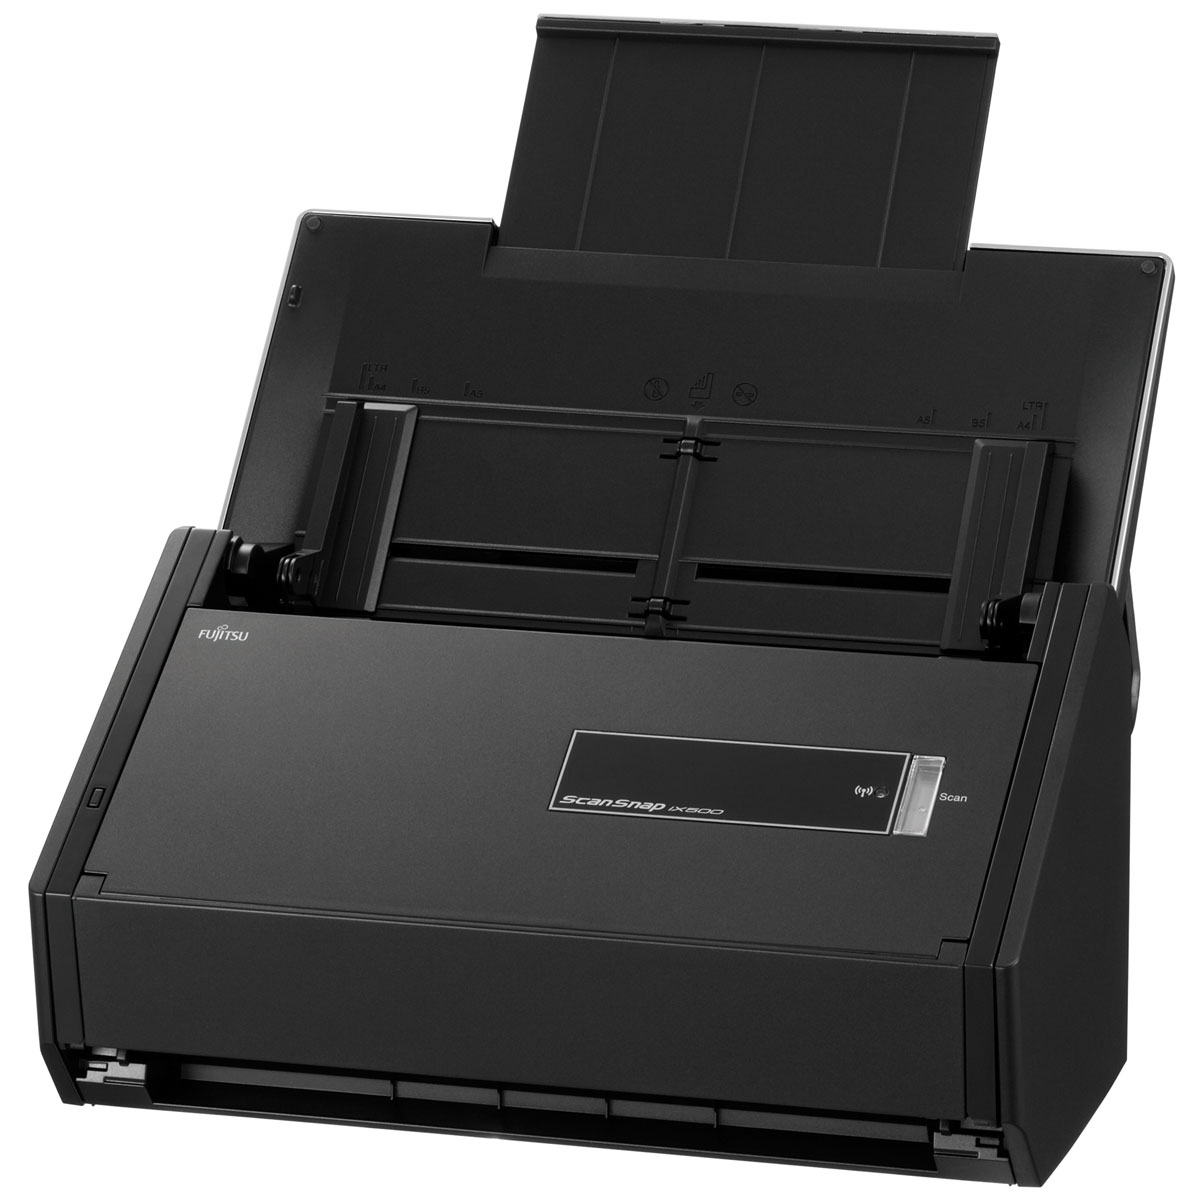 Scanner Fujitsu ScanSnap iX500 Scanner avec chargeur automatique (USB 3.0 / Wi-Fi)